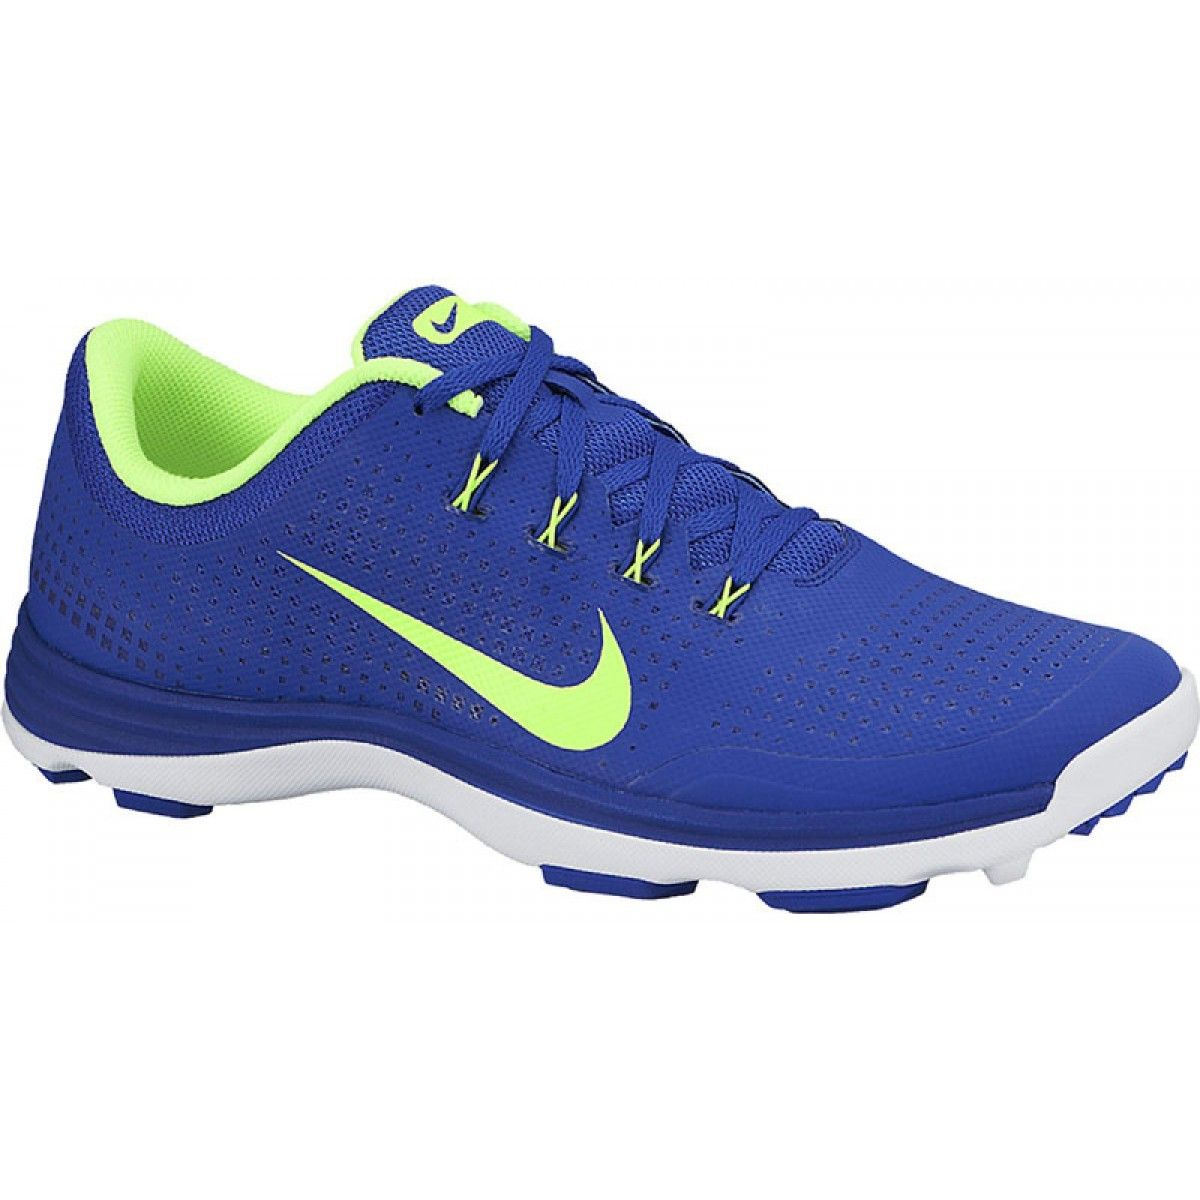 Lunar Cypress- Blue golf shoes